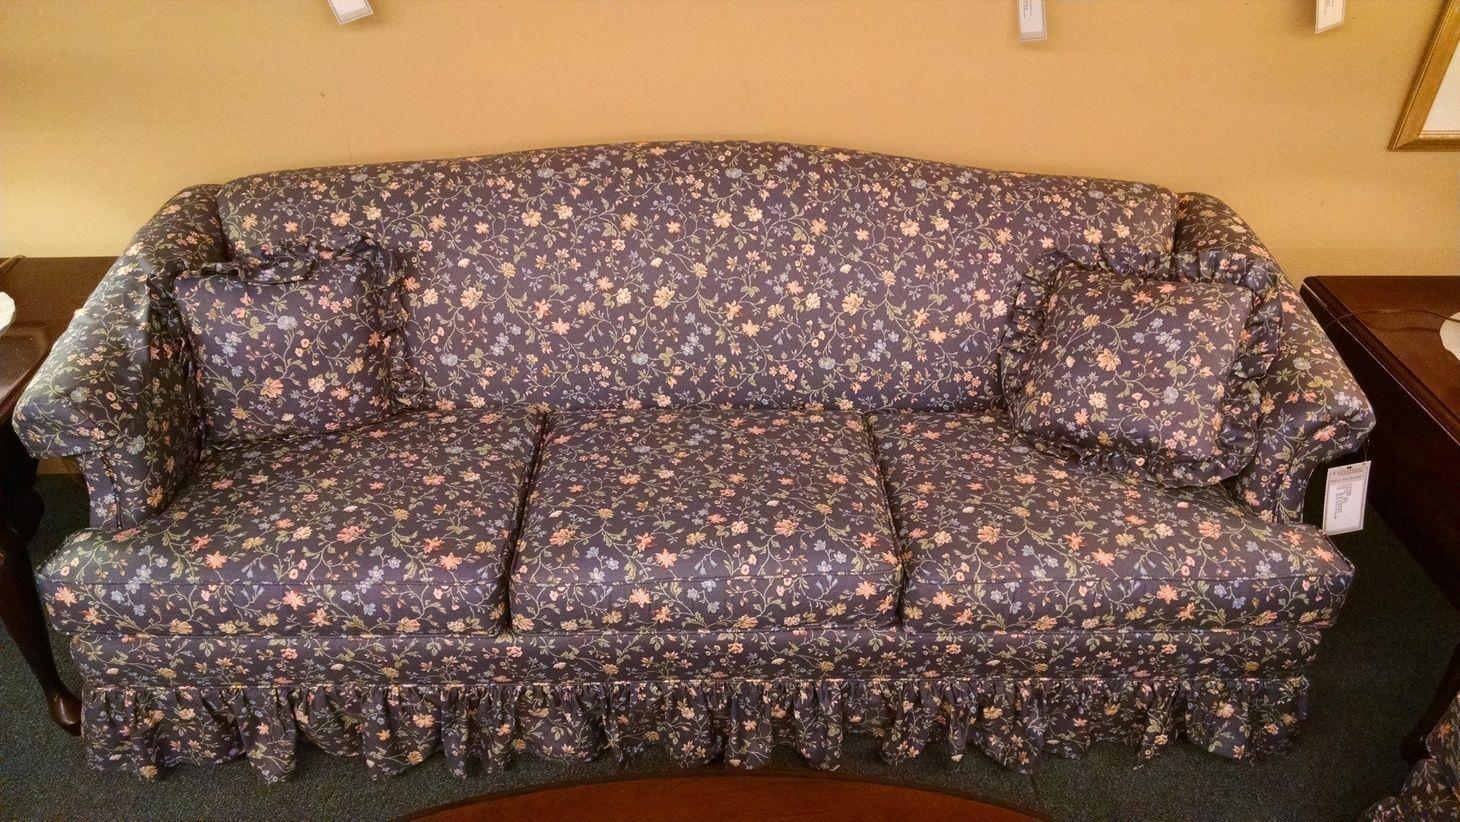 FLORAL PRINT BLUE SOFA Delmarva Furniture Consignment